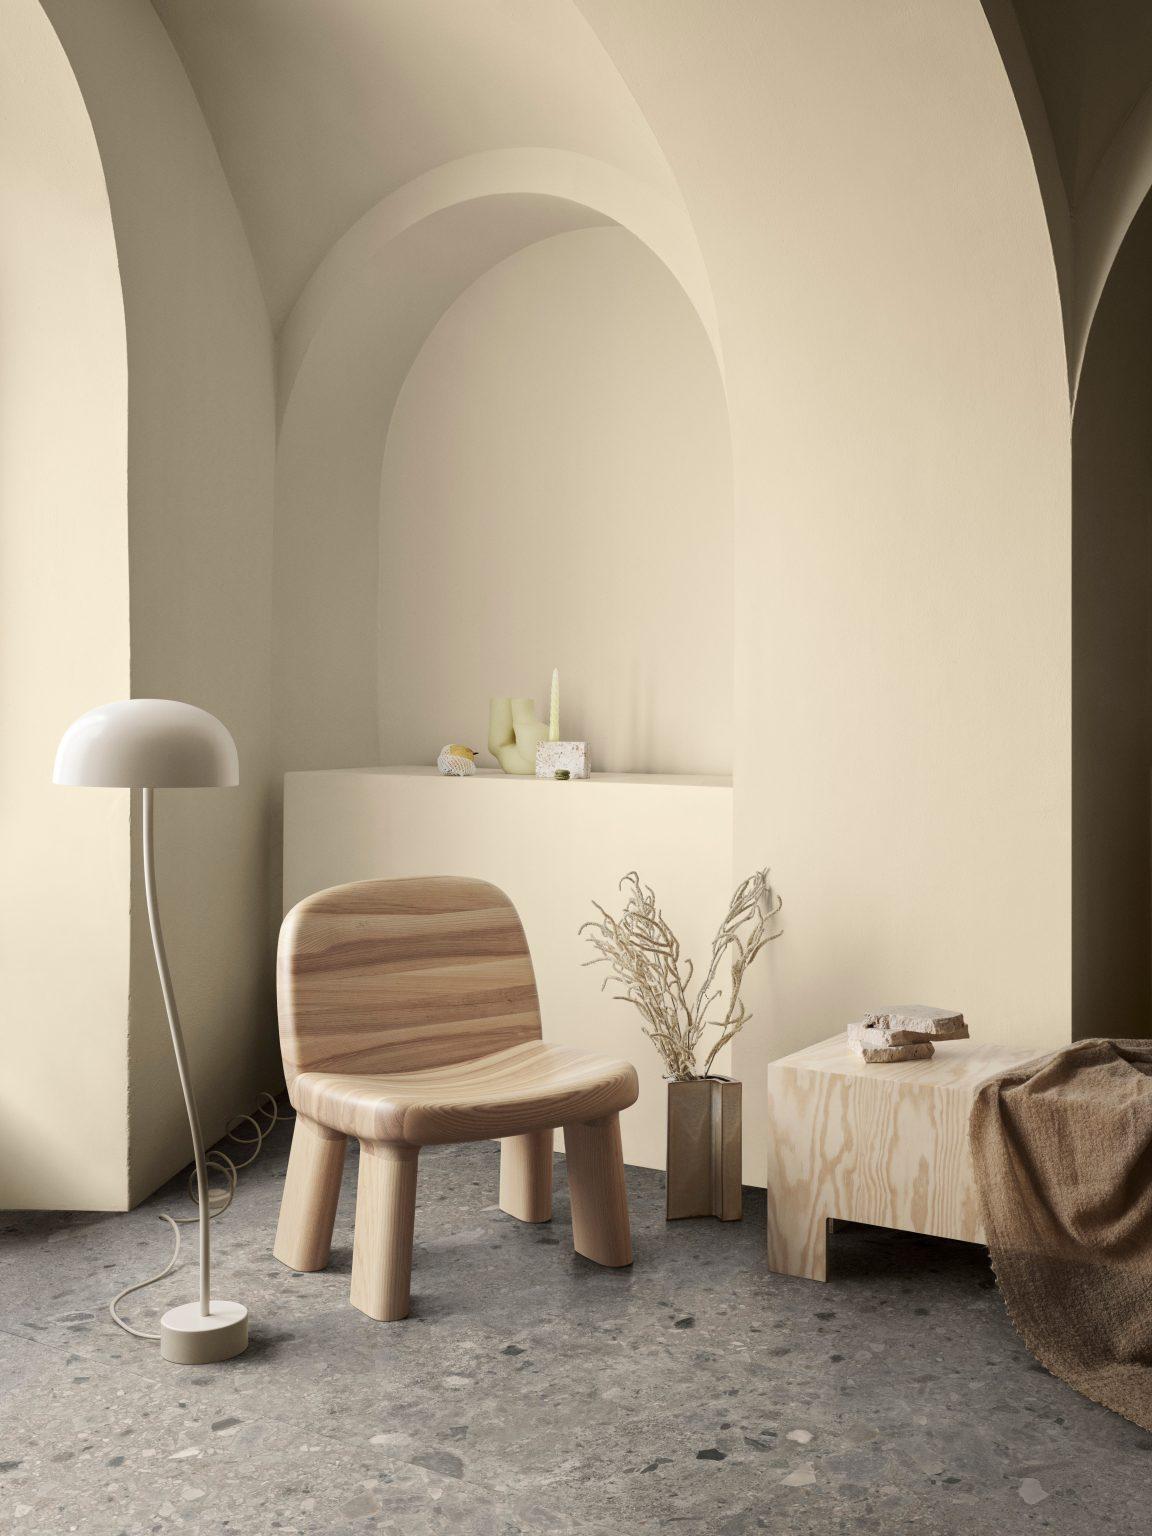 Biennale Interieur - Belgium's leading design and interior event - Maximus-project-1-new.jpg